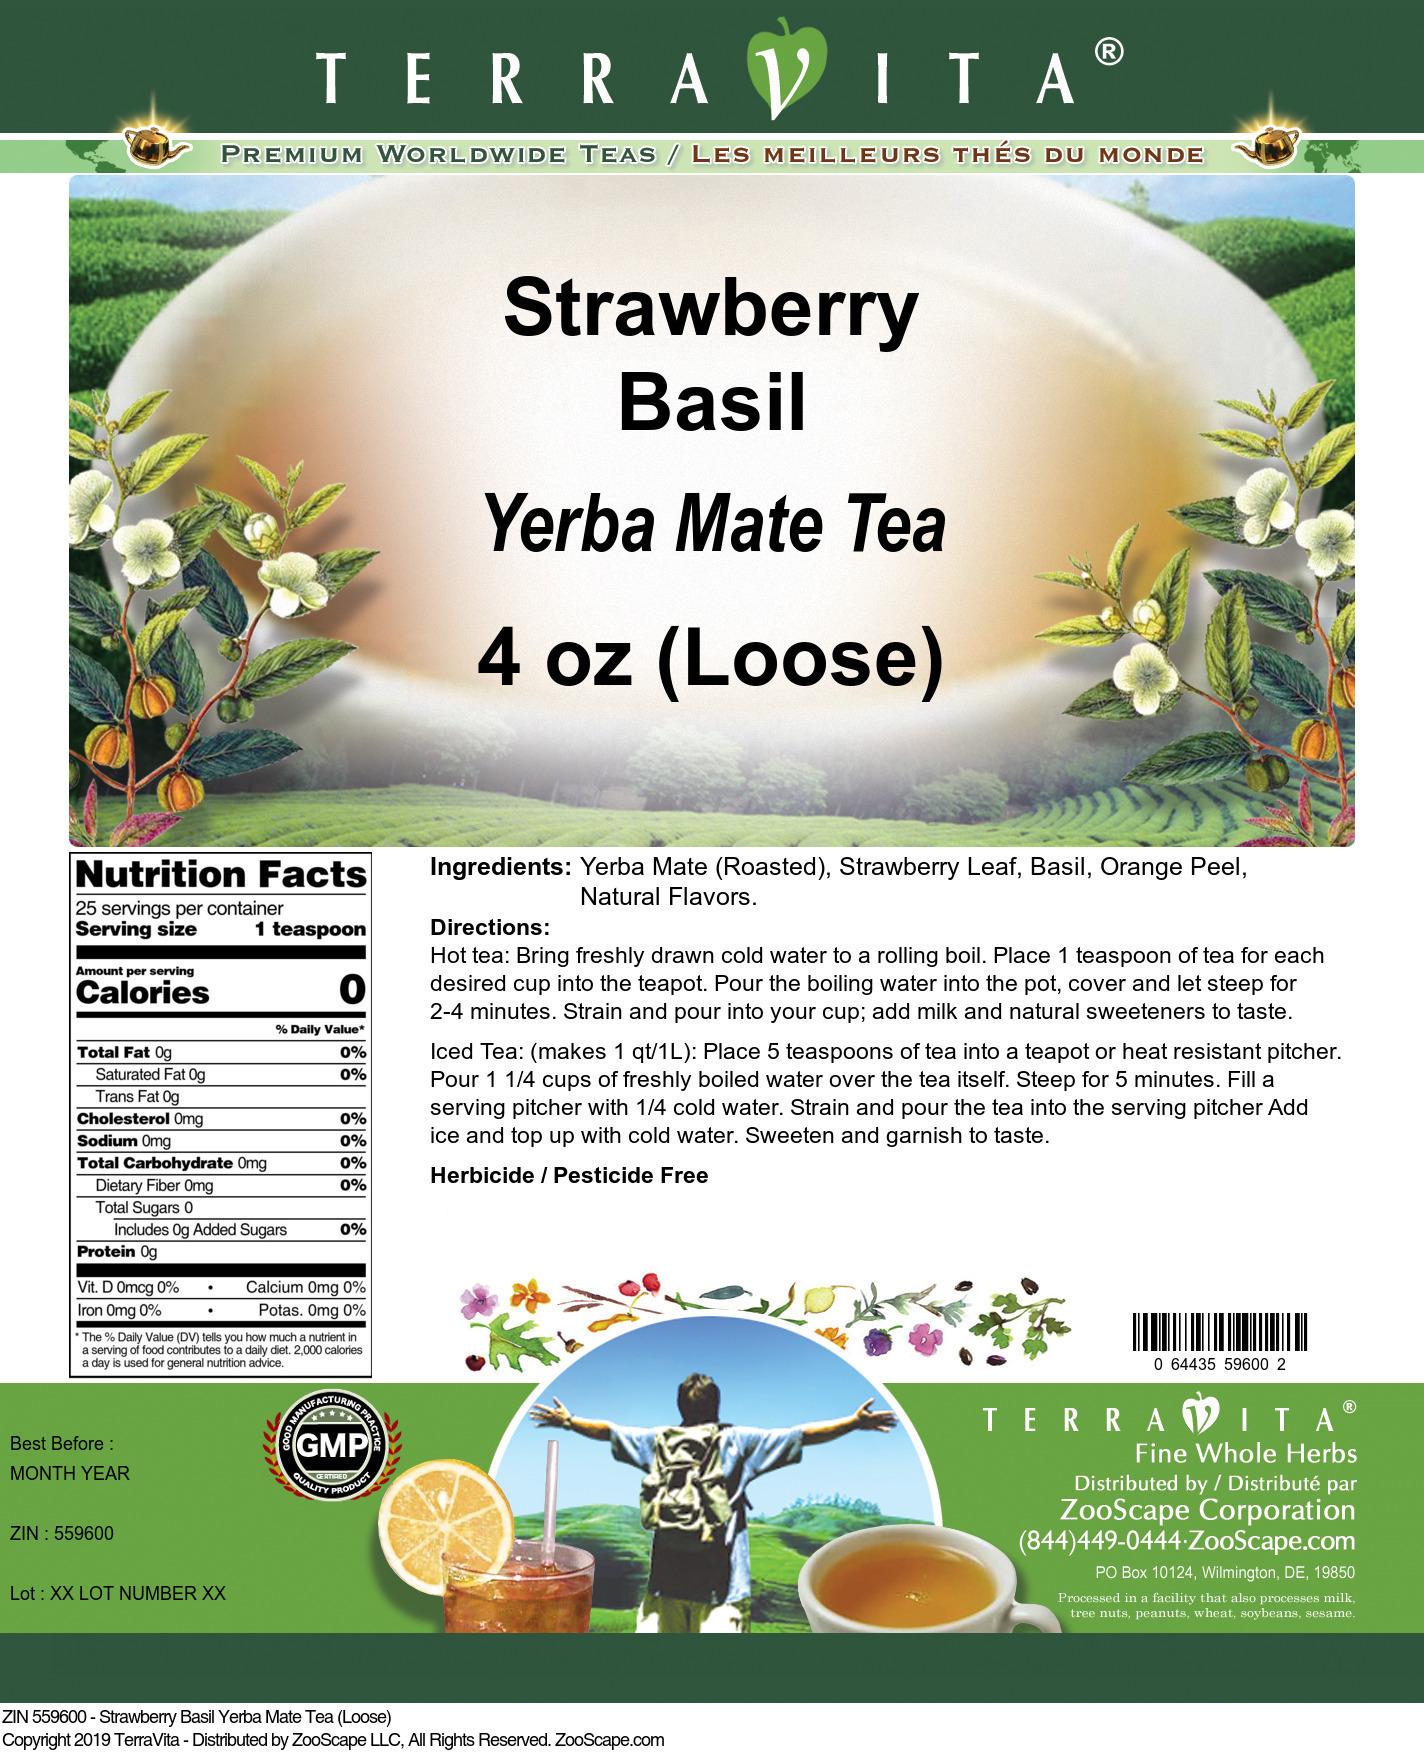 Strawberry Basil Yerba Mate